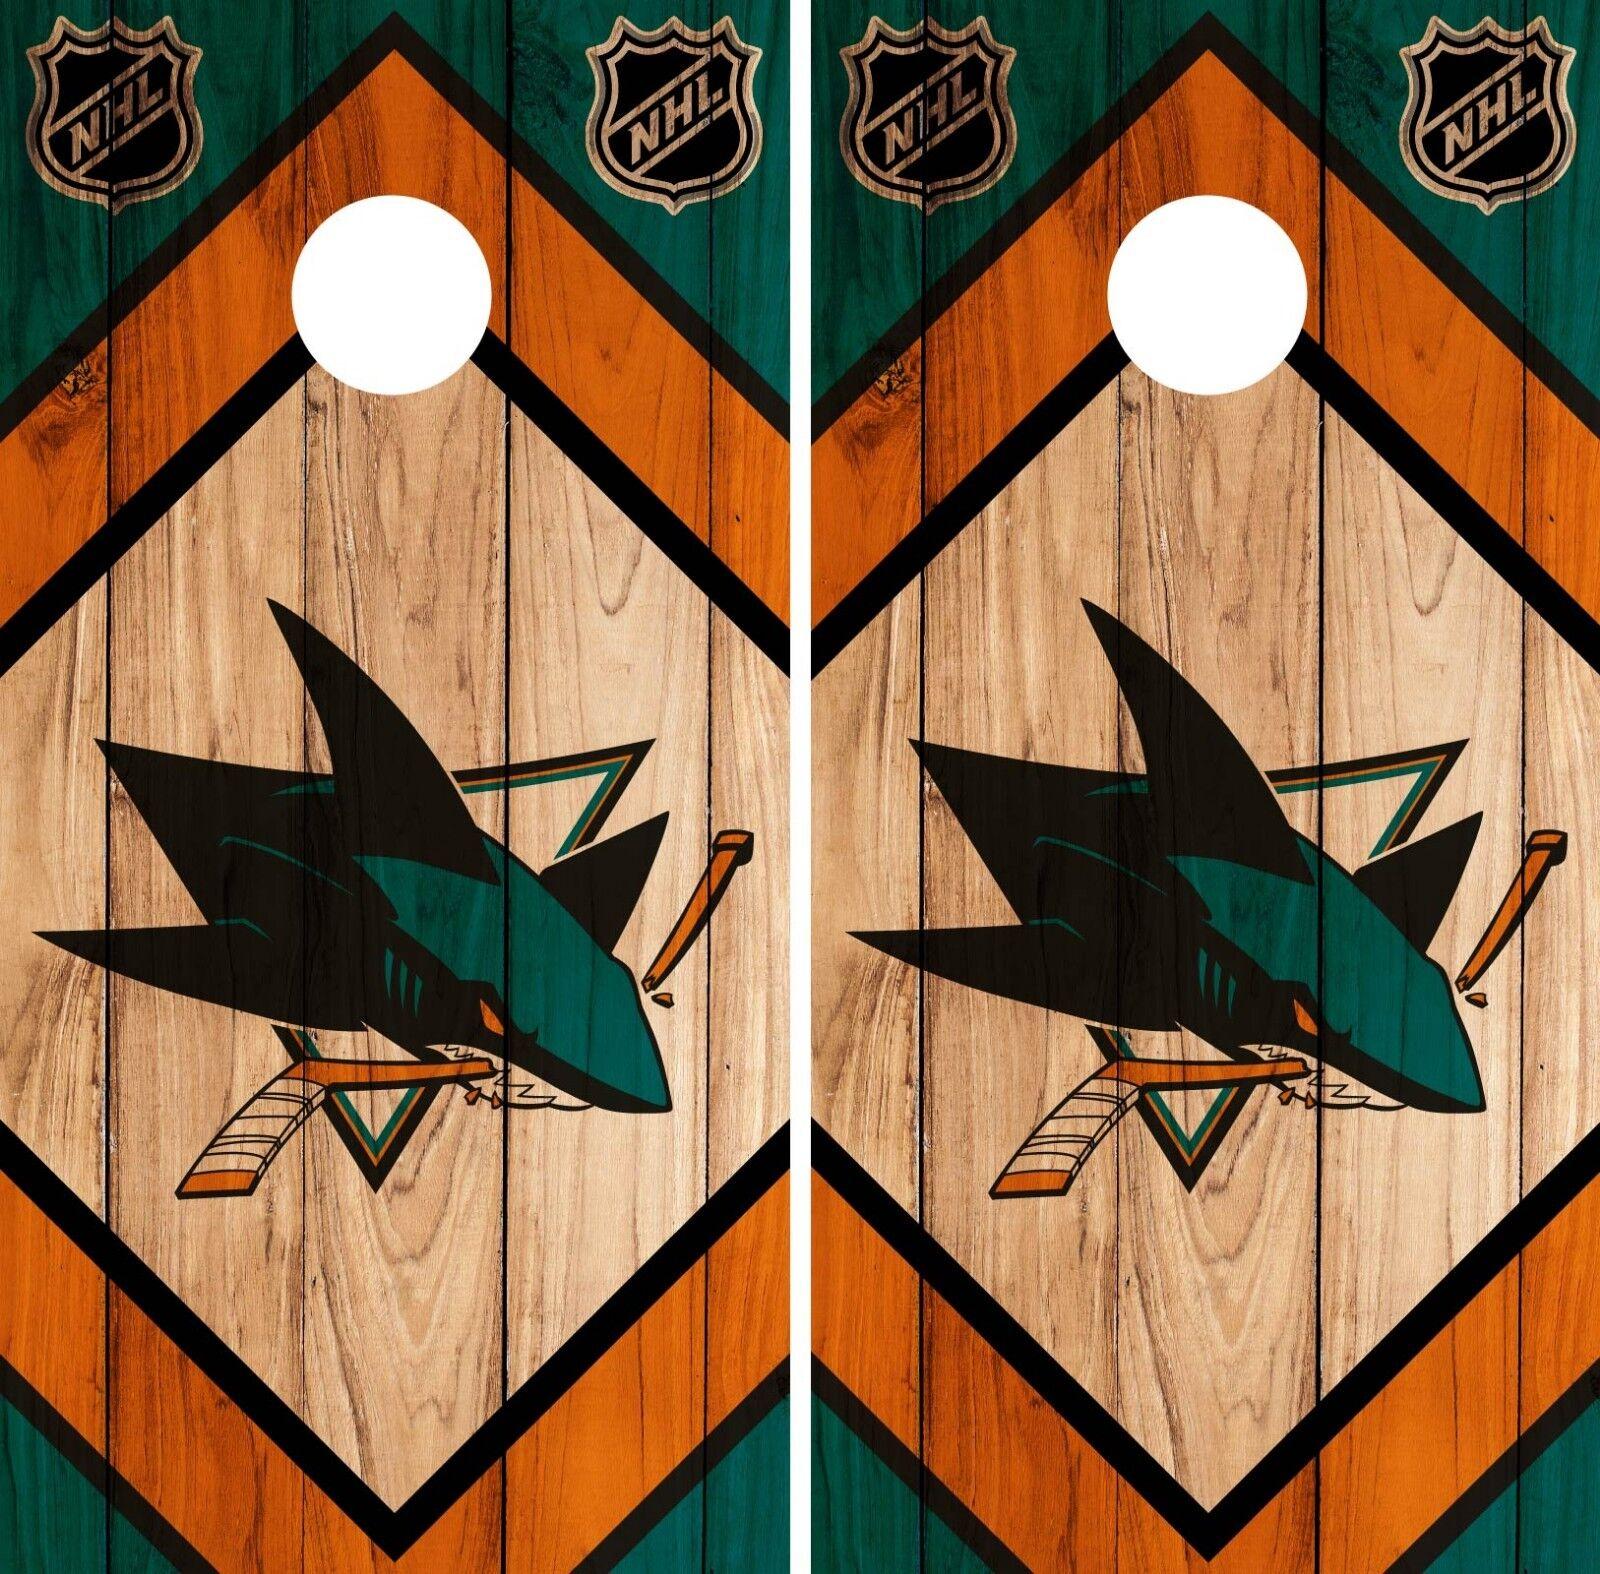 San Jose Sharks Cornhole Wrap NHL Game Board Skin Set Vinyl Decal CO205